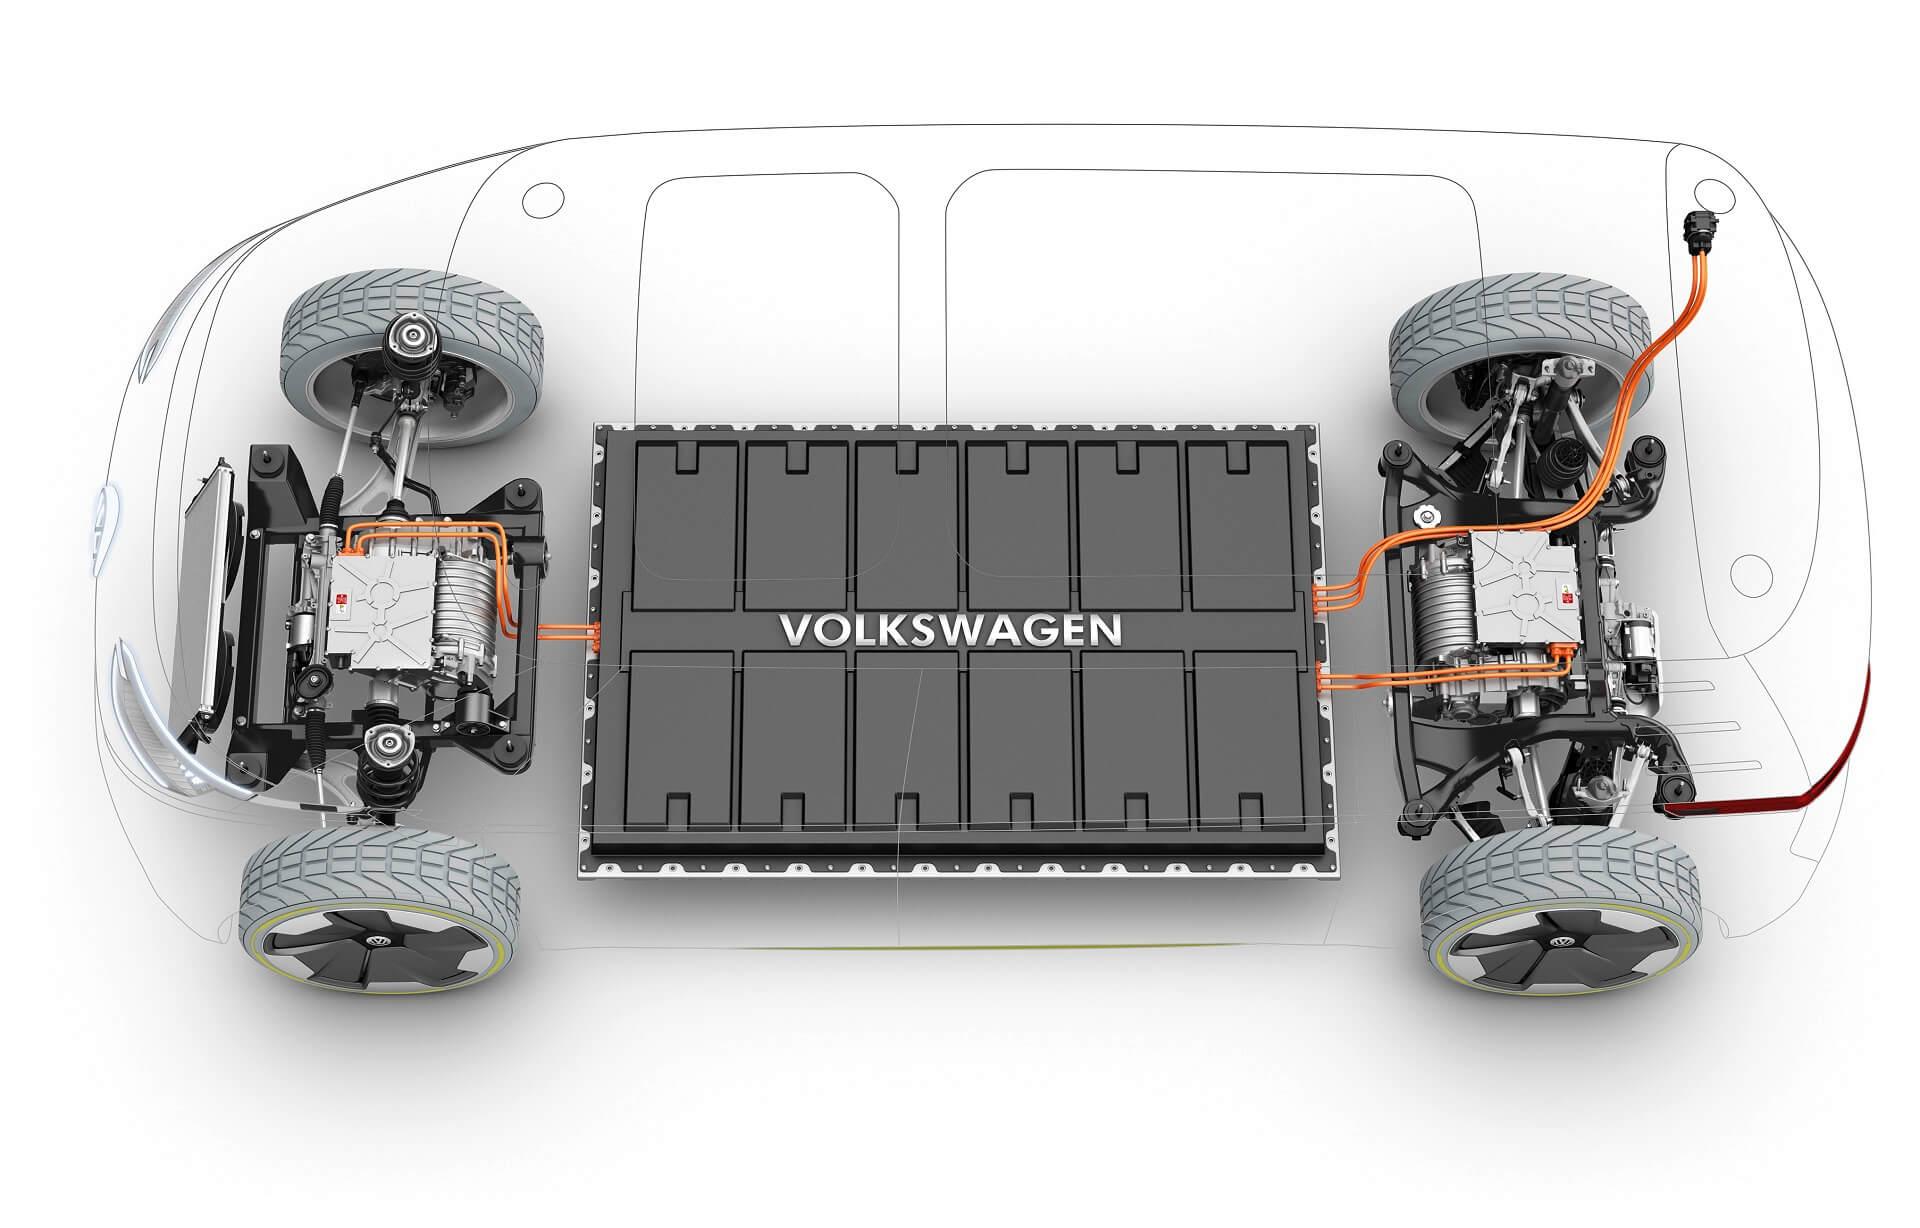 Volkswagen - Ηλεκτρικά αυτοκίνητα και Λίθιο - Απεικόνιση ηλεκτρικού συστήματος